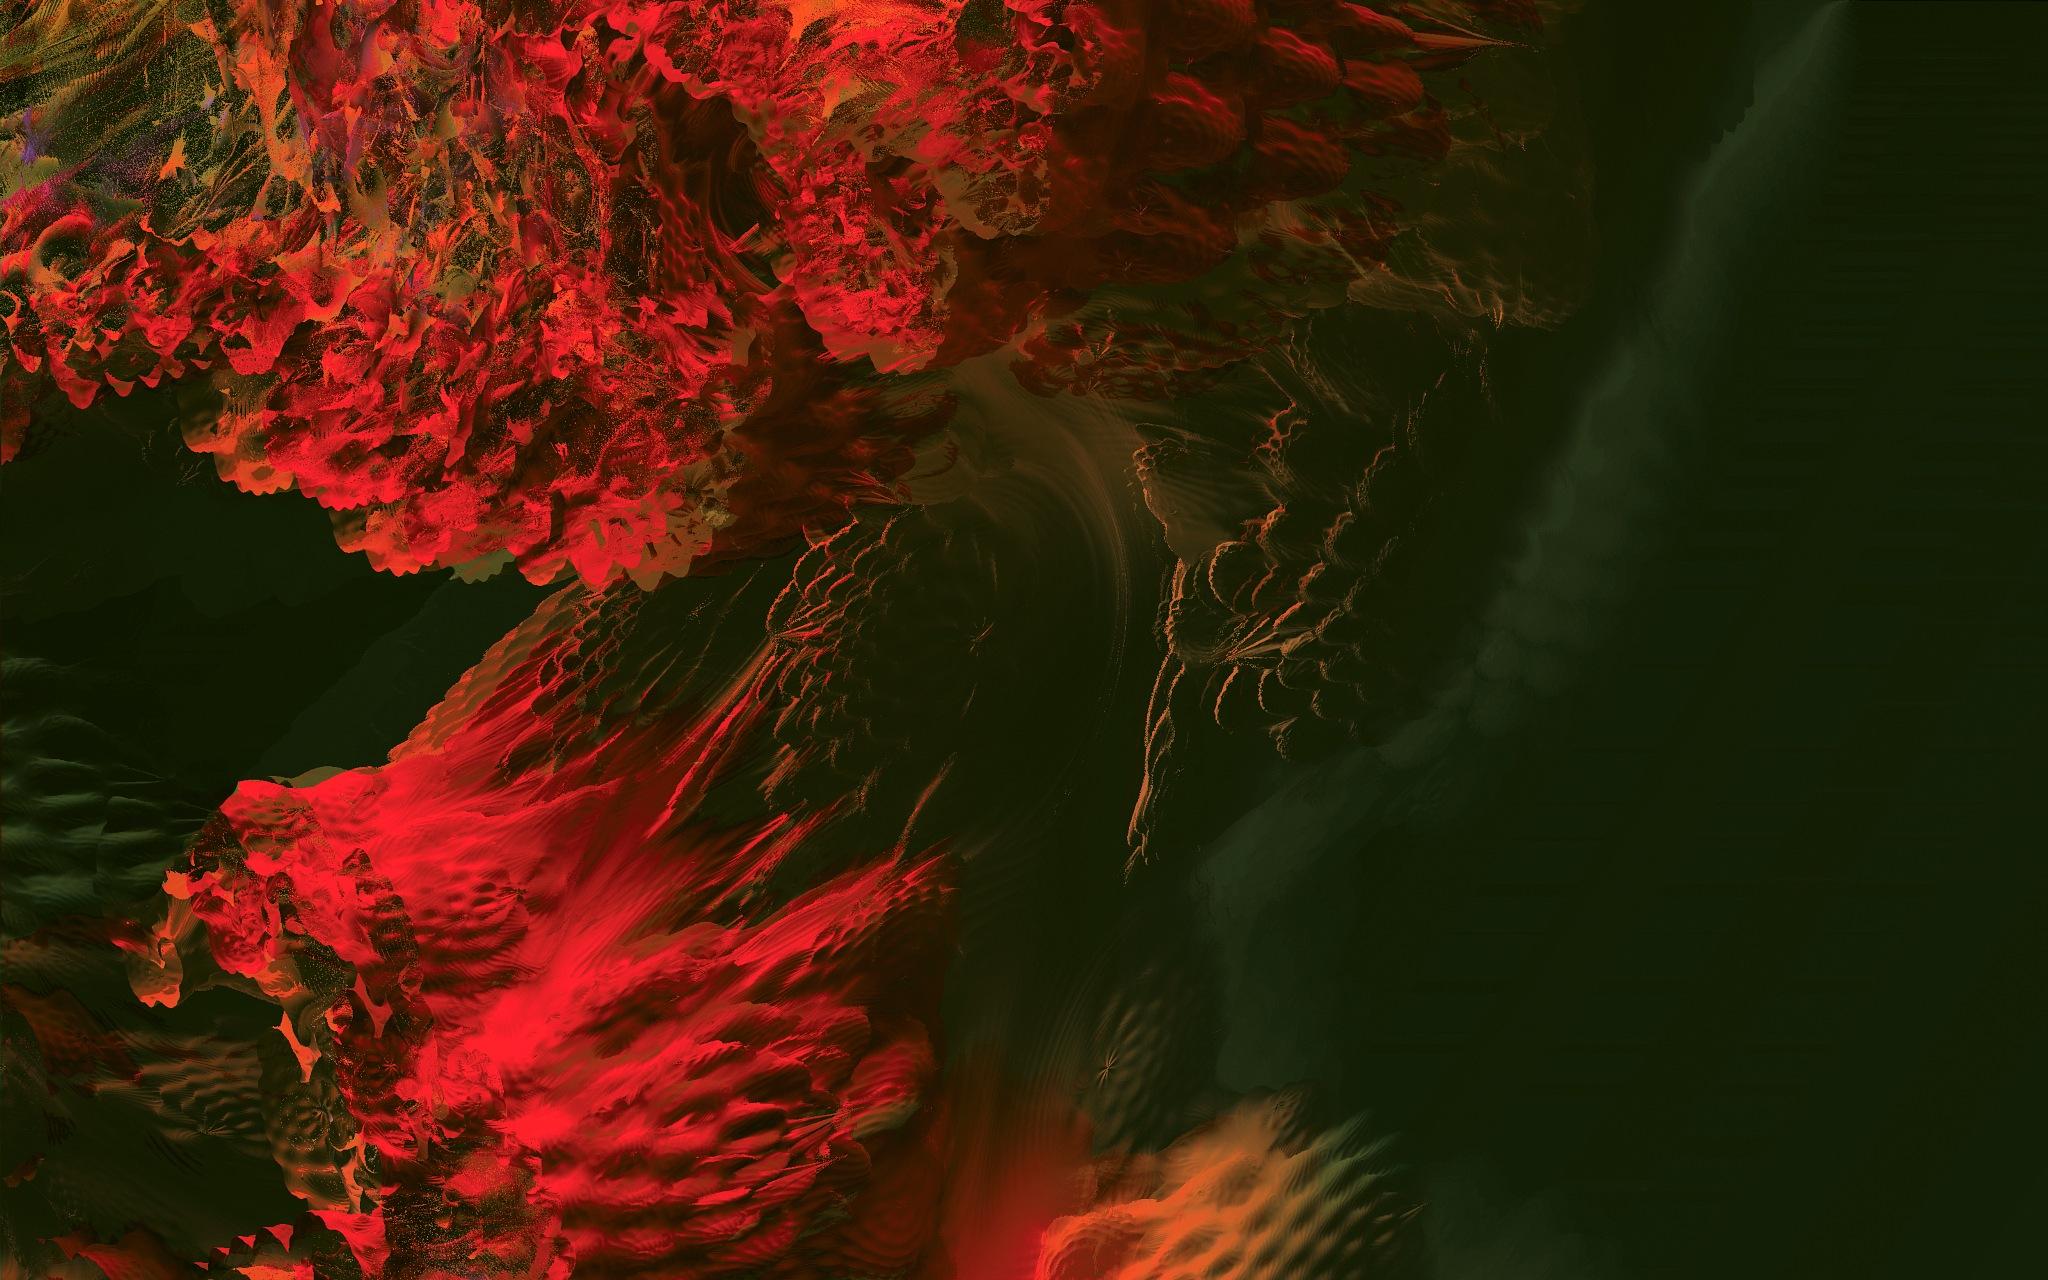 Firestorm by John Hill